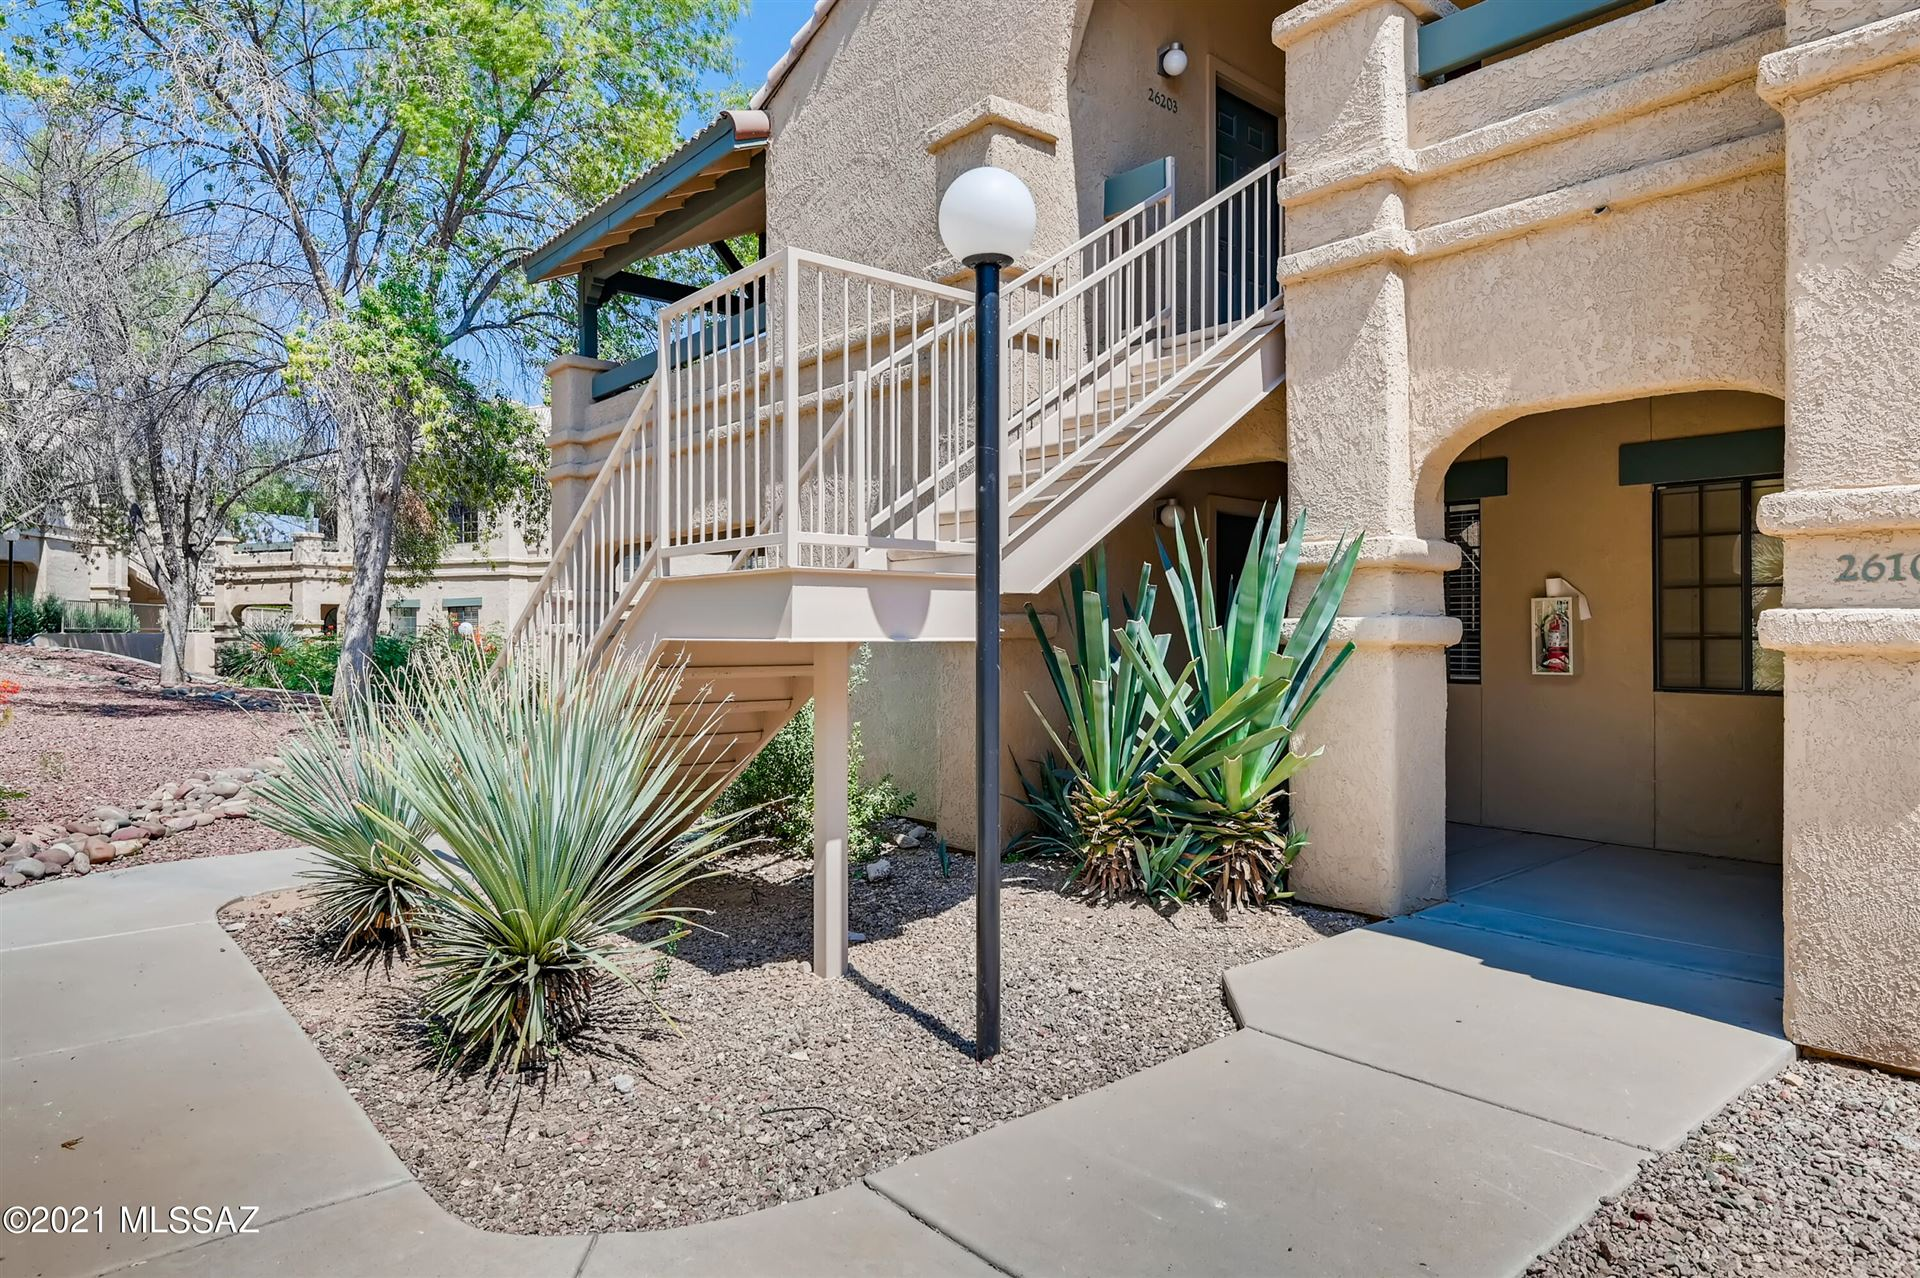 101 S Players Club Drive #26103, Tucson, AZ 85745 - MLS#: 22123714